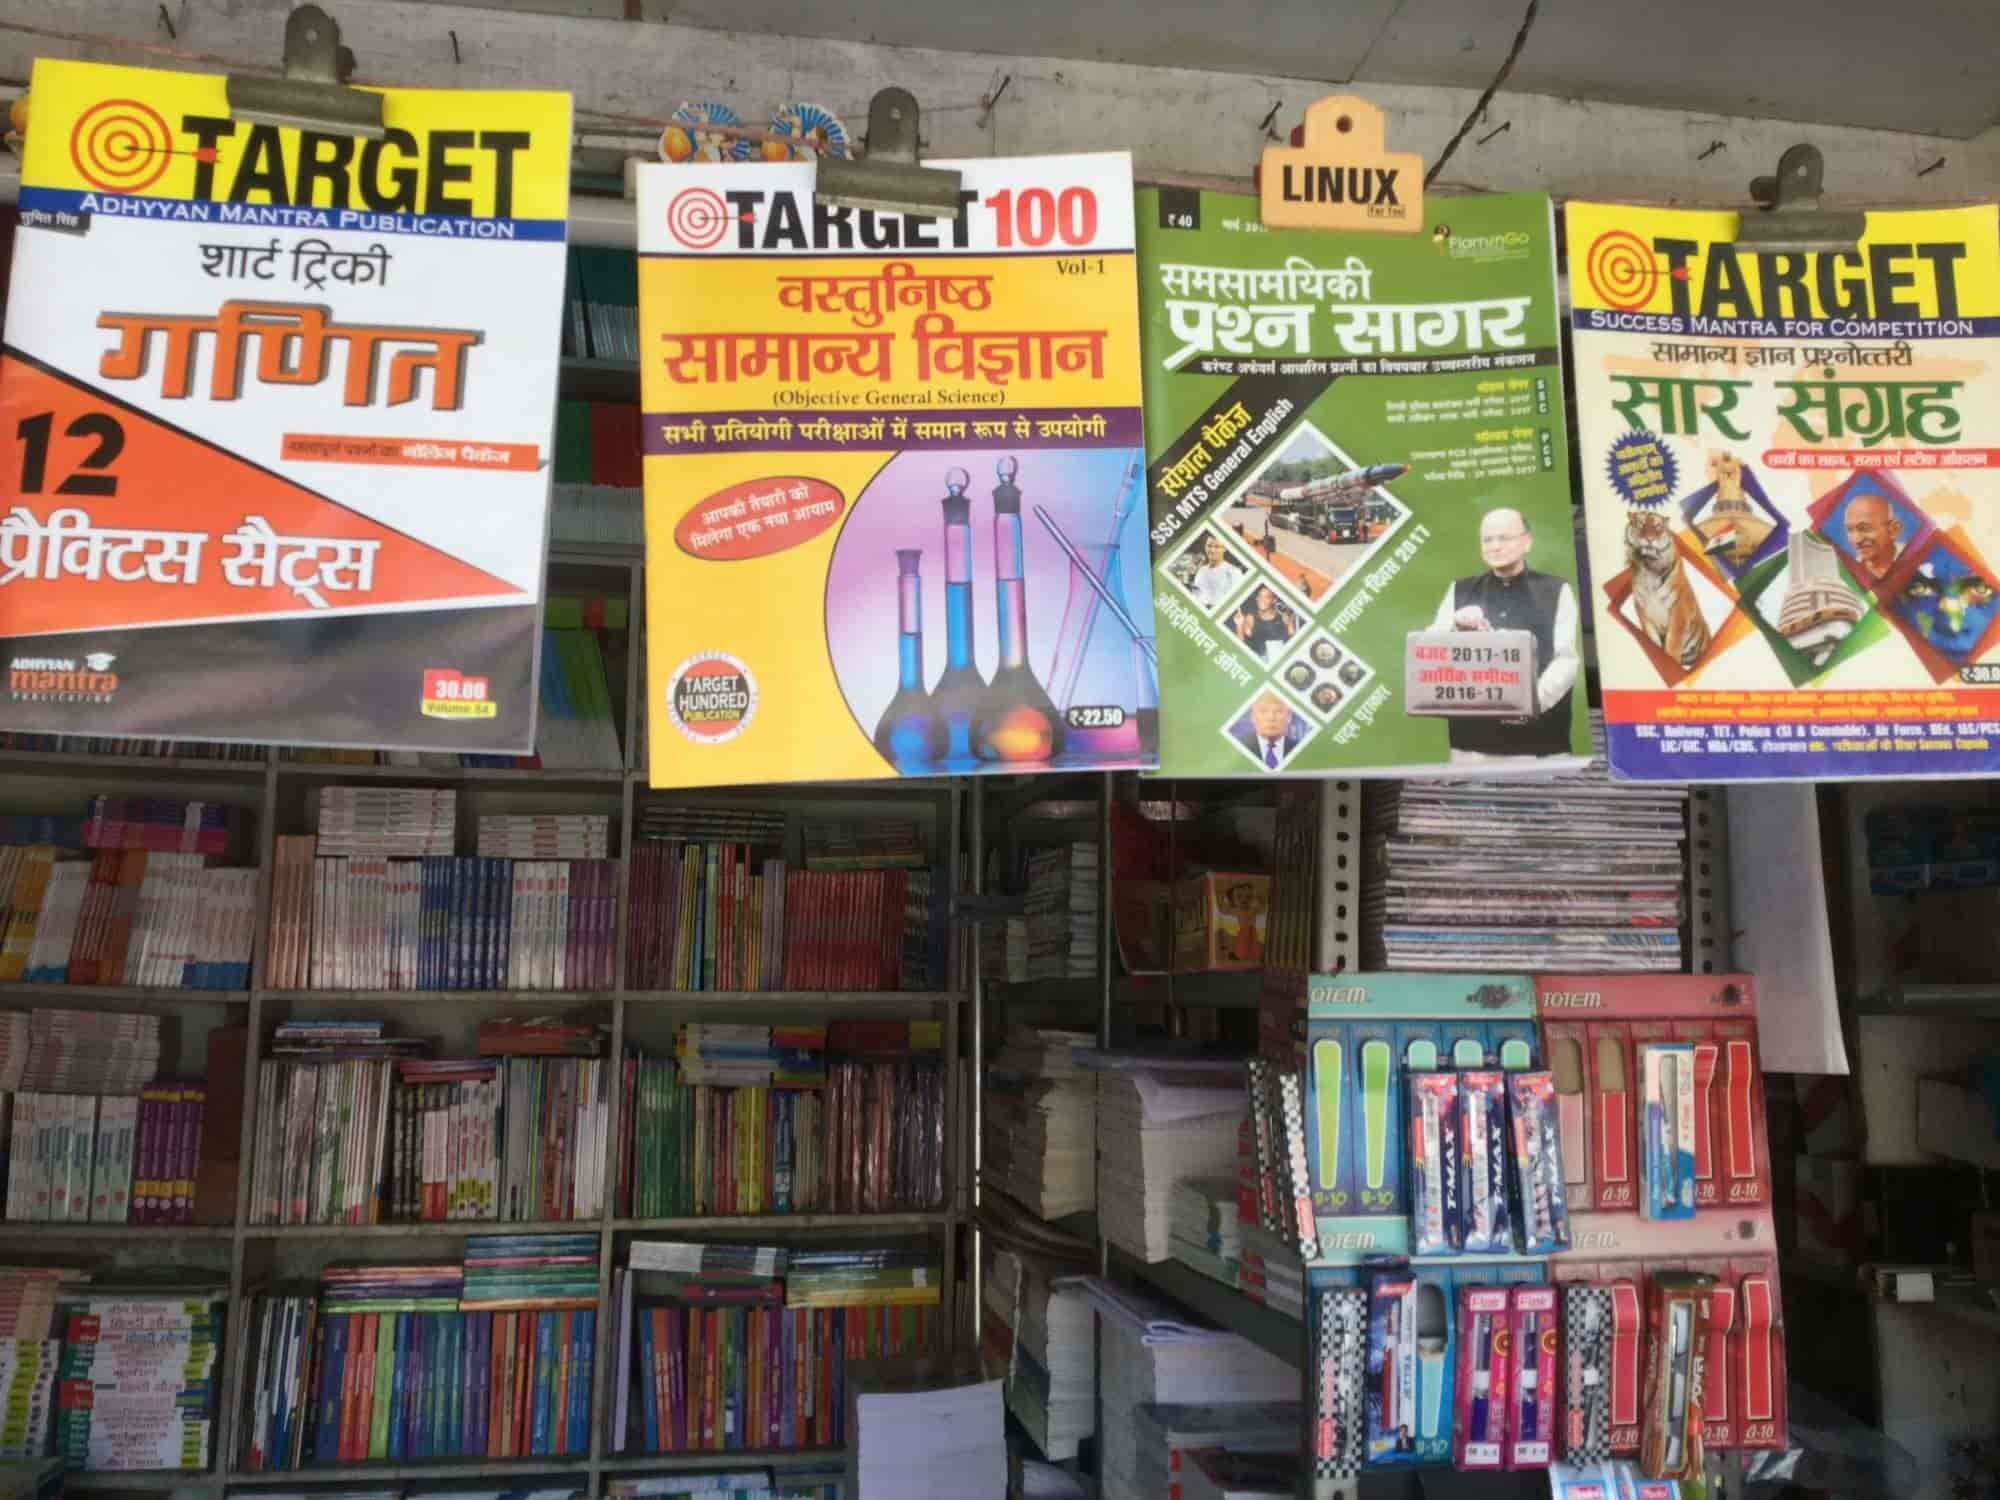 Vinit Book Store, Ghanta Ghar Road - Book Shops in Meerut